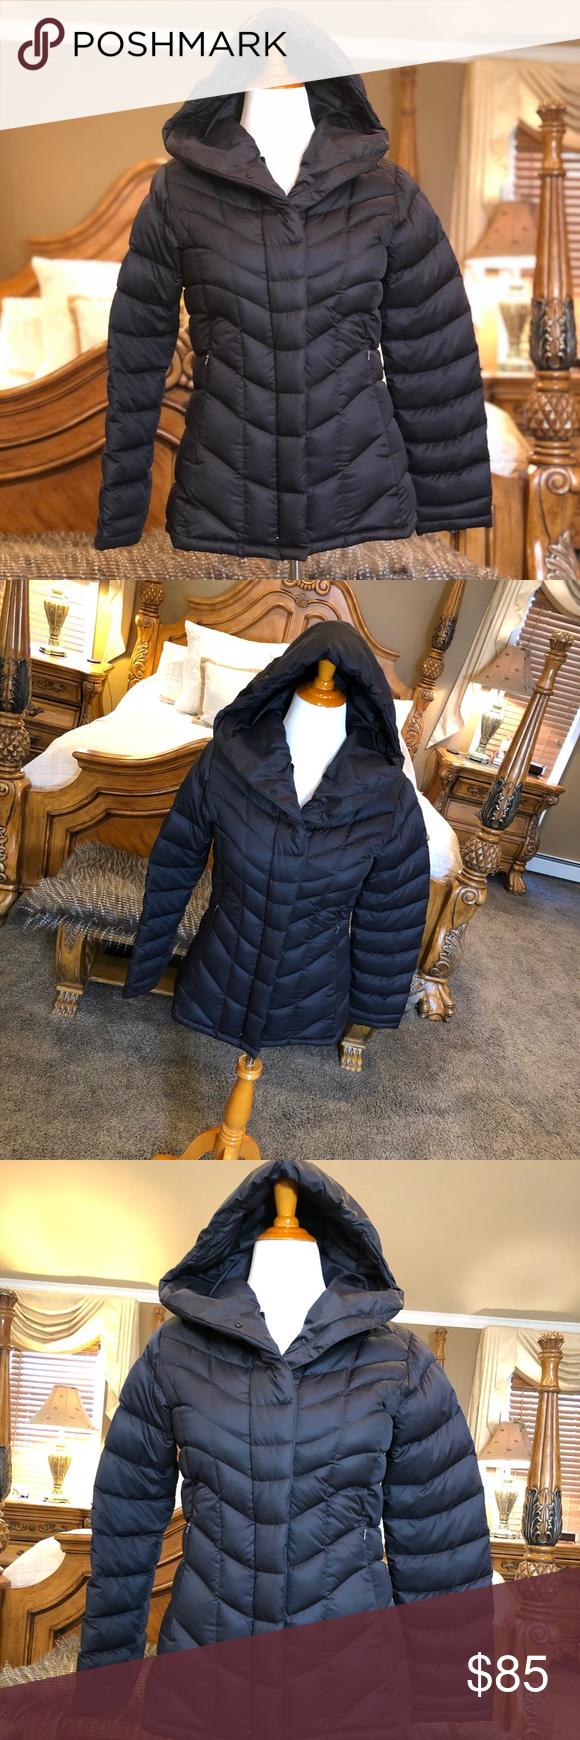 Patagonia Black Down Puffer Coat Size Medium Down puffer